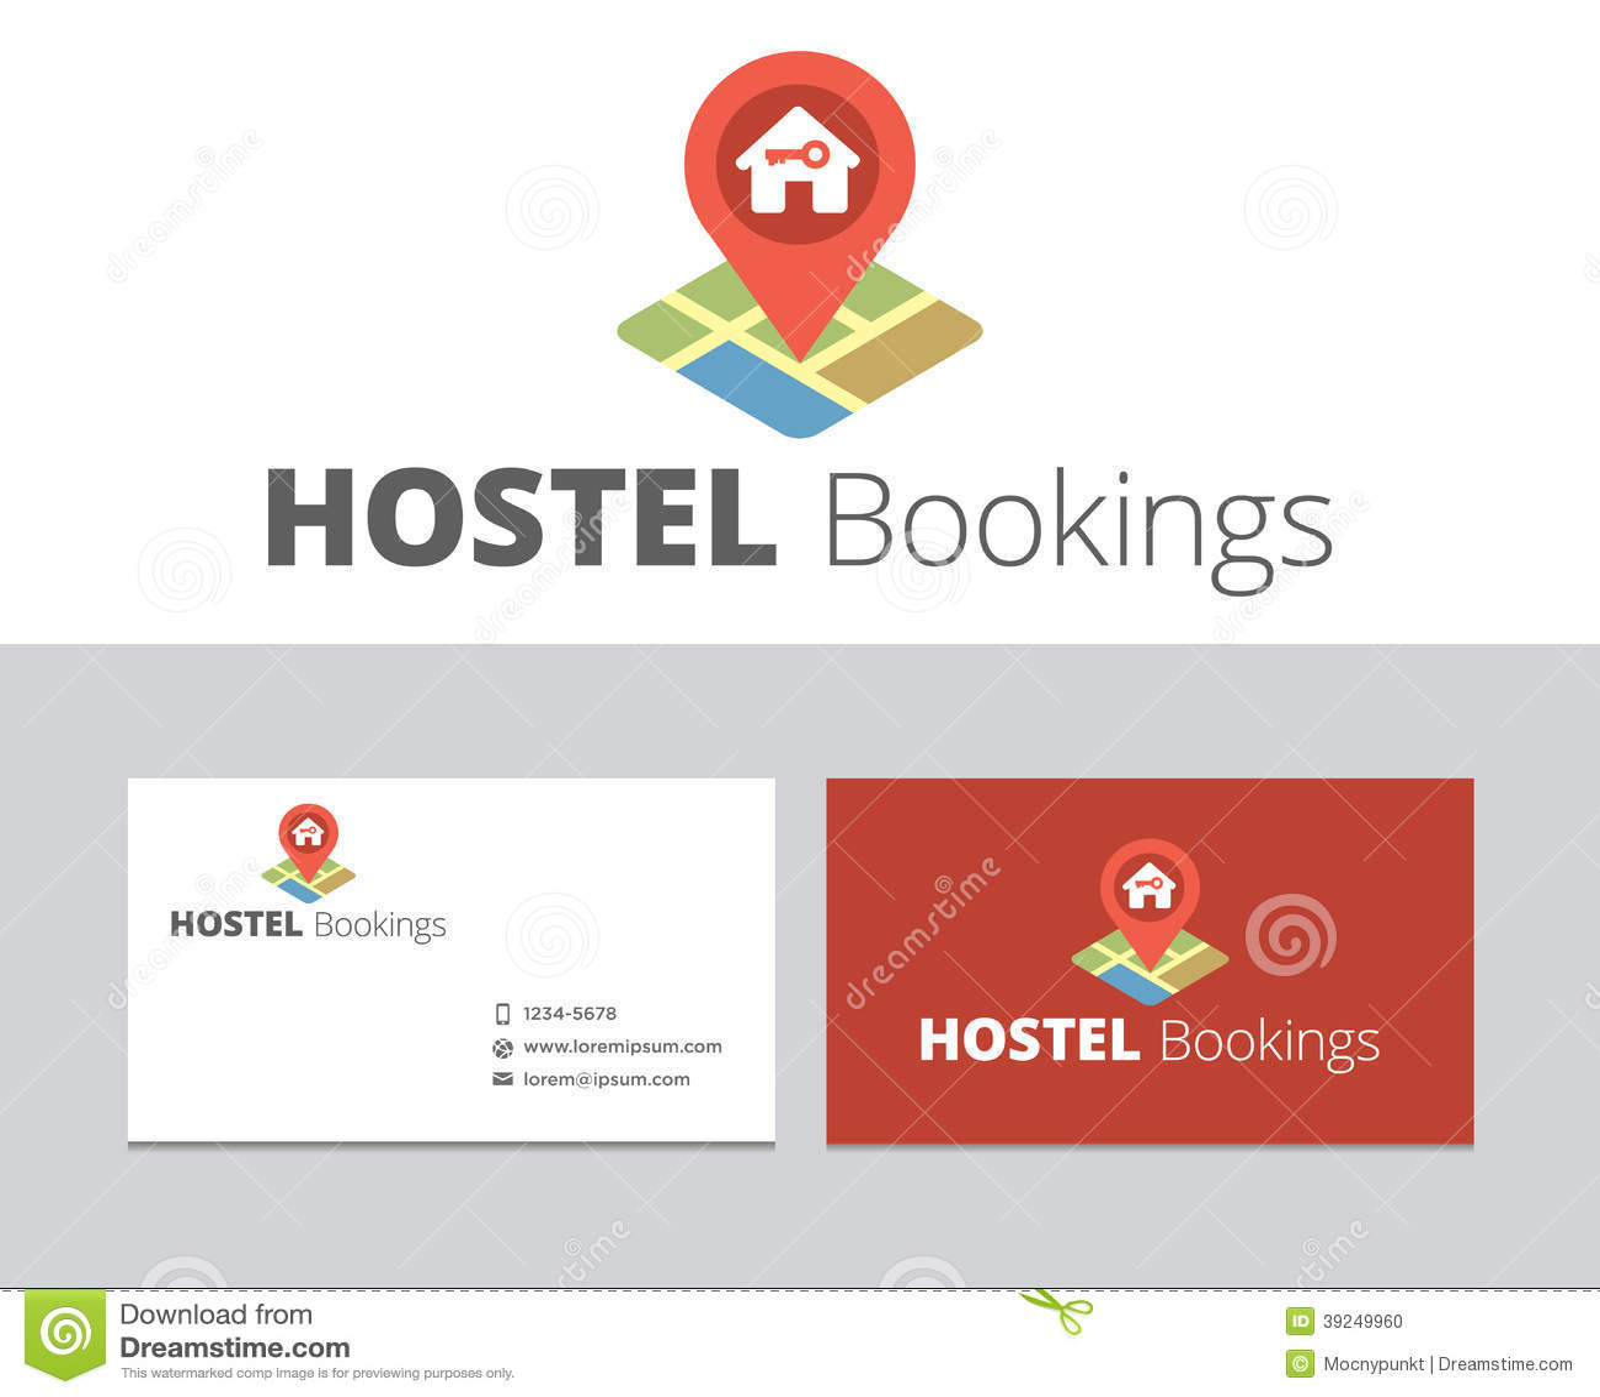 Hostel Bookings Logo Stock Vector Image 39249960